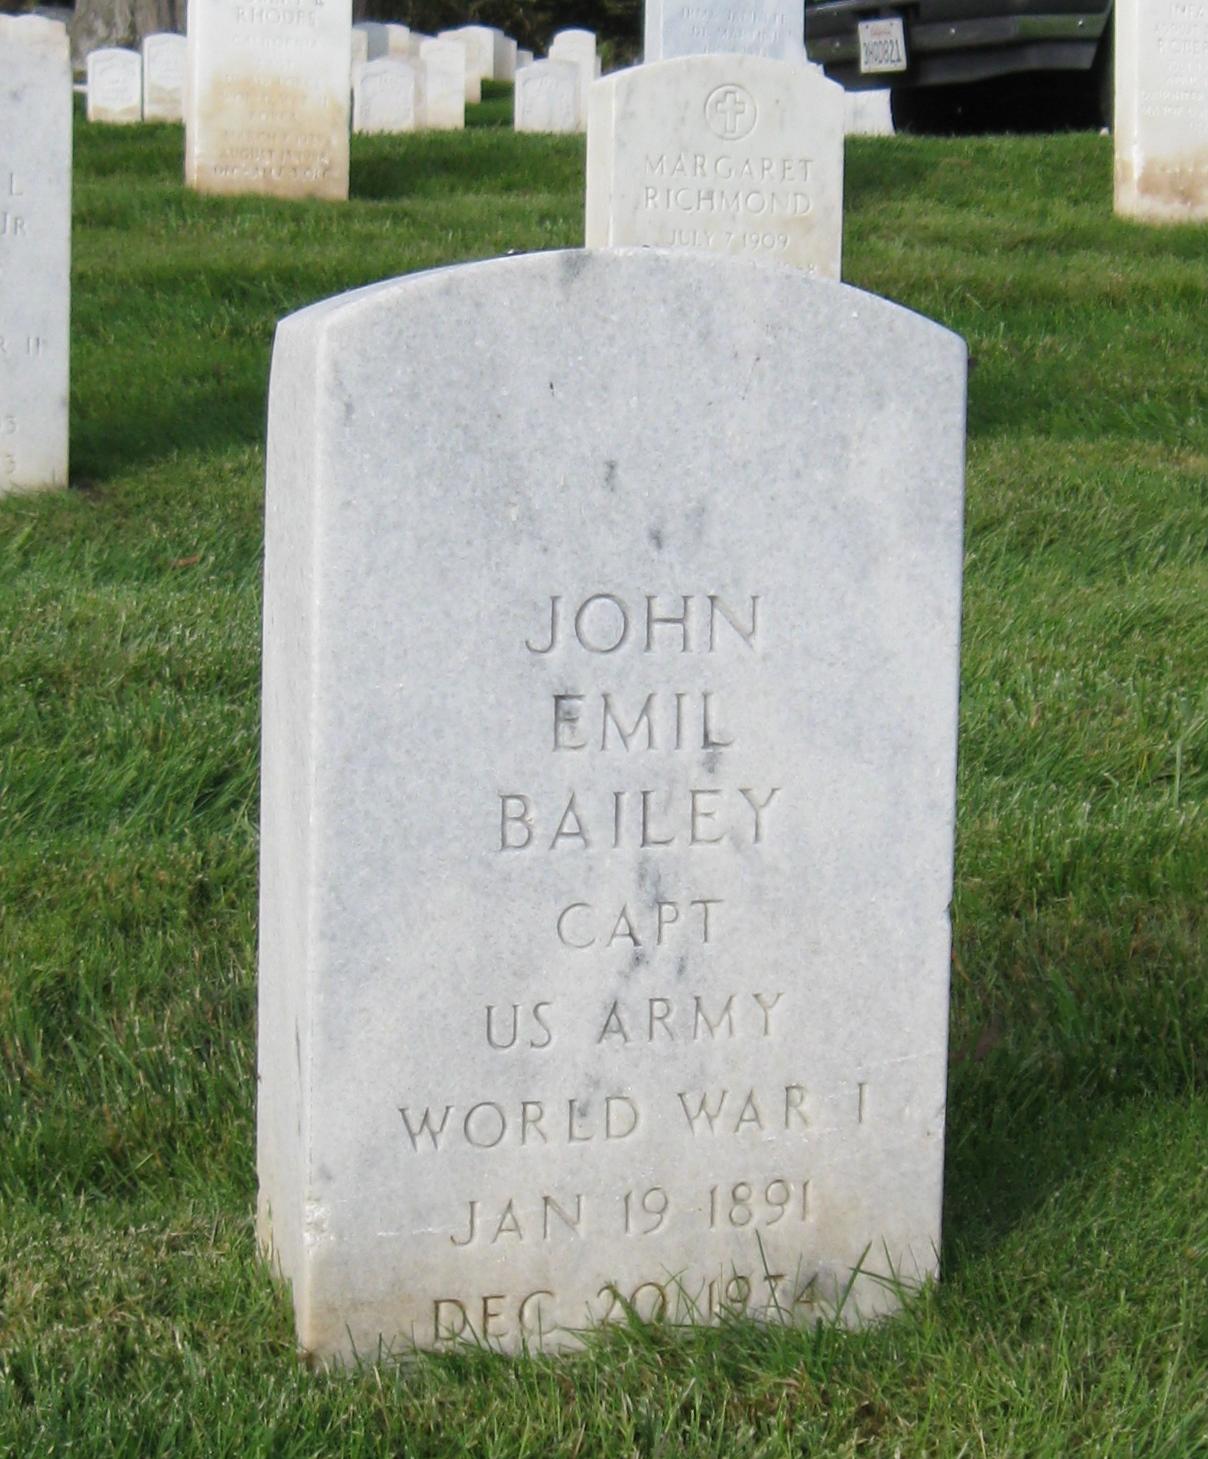 Capt John Emil Bailey